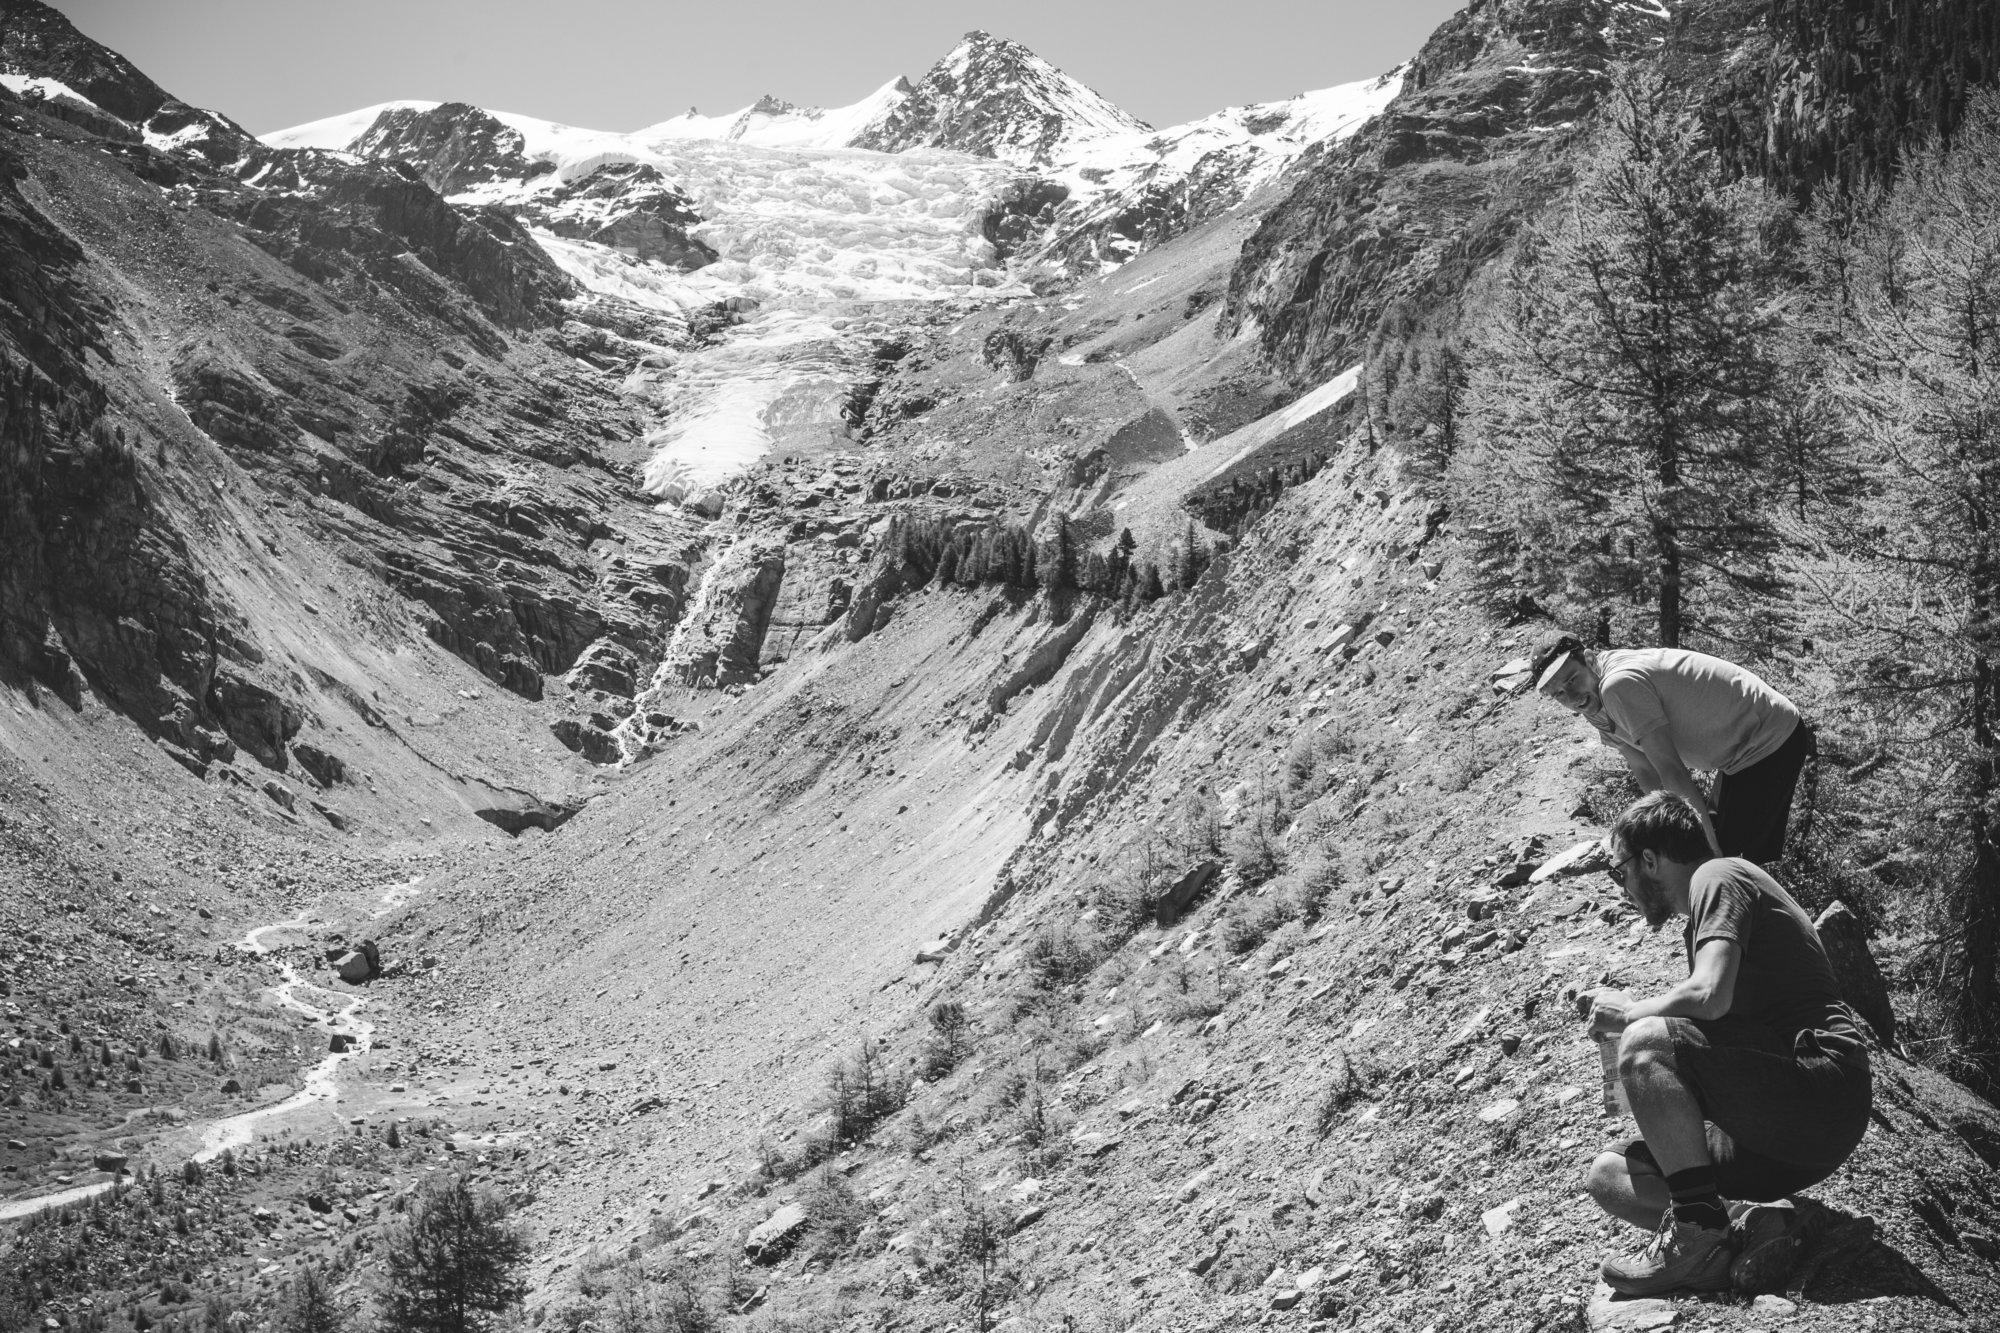 037-kasuma-photografie-photoblog-travelblog-outdoor-camping-2017-gletschertor-alpia-graechen